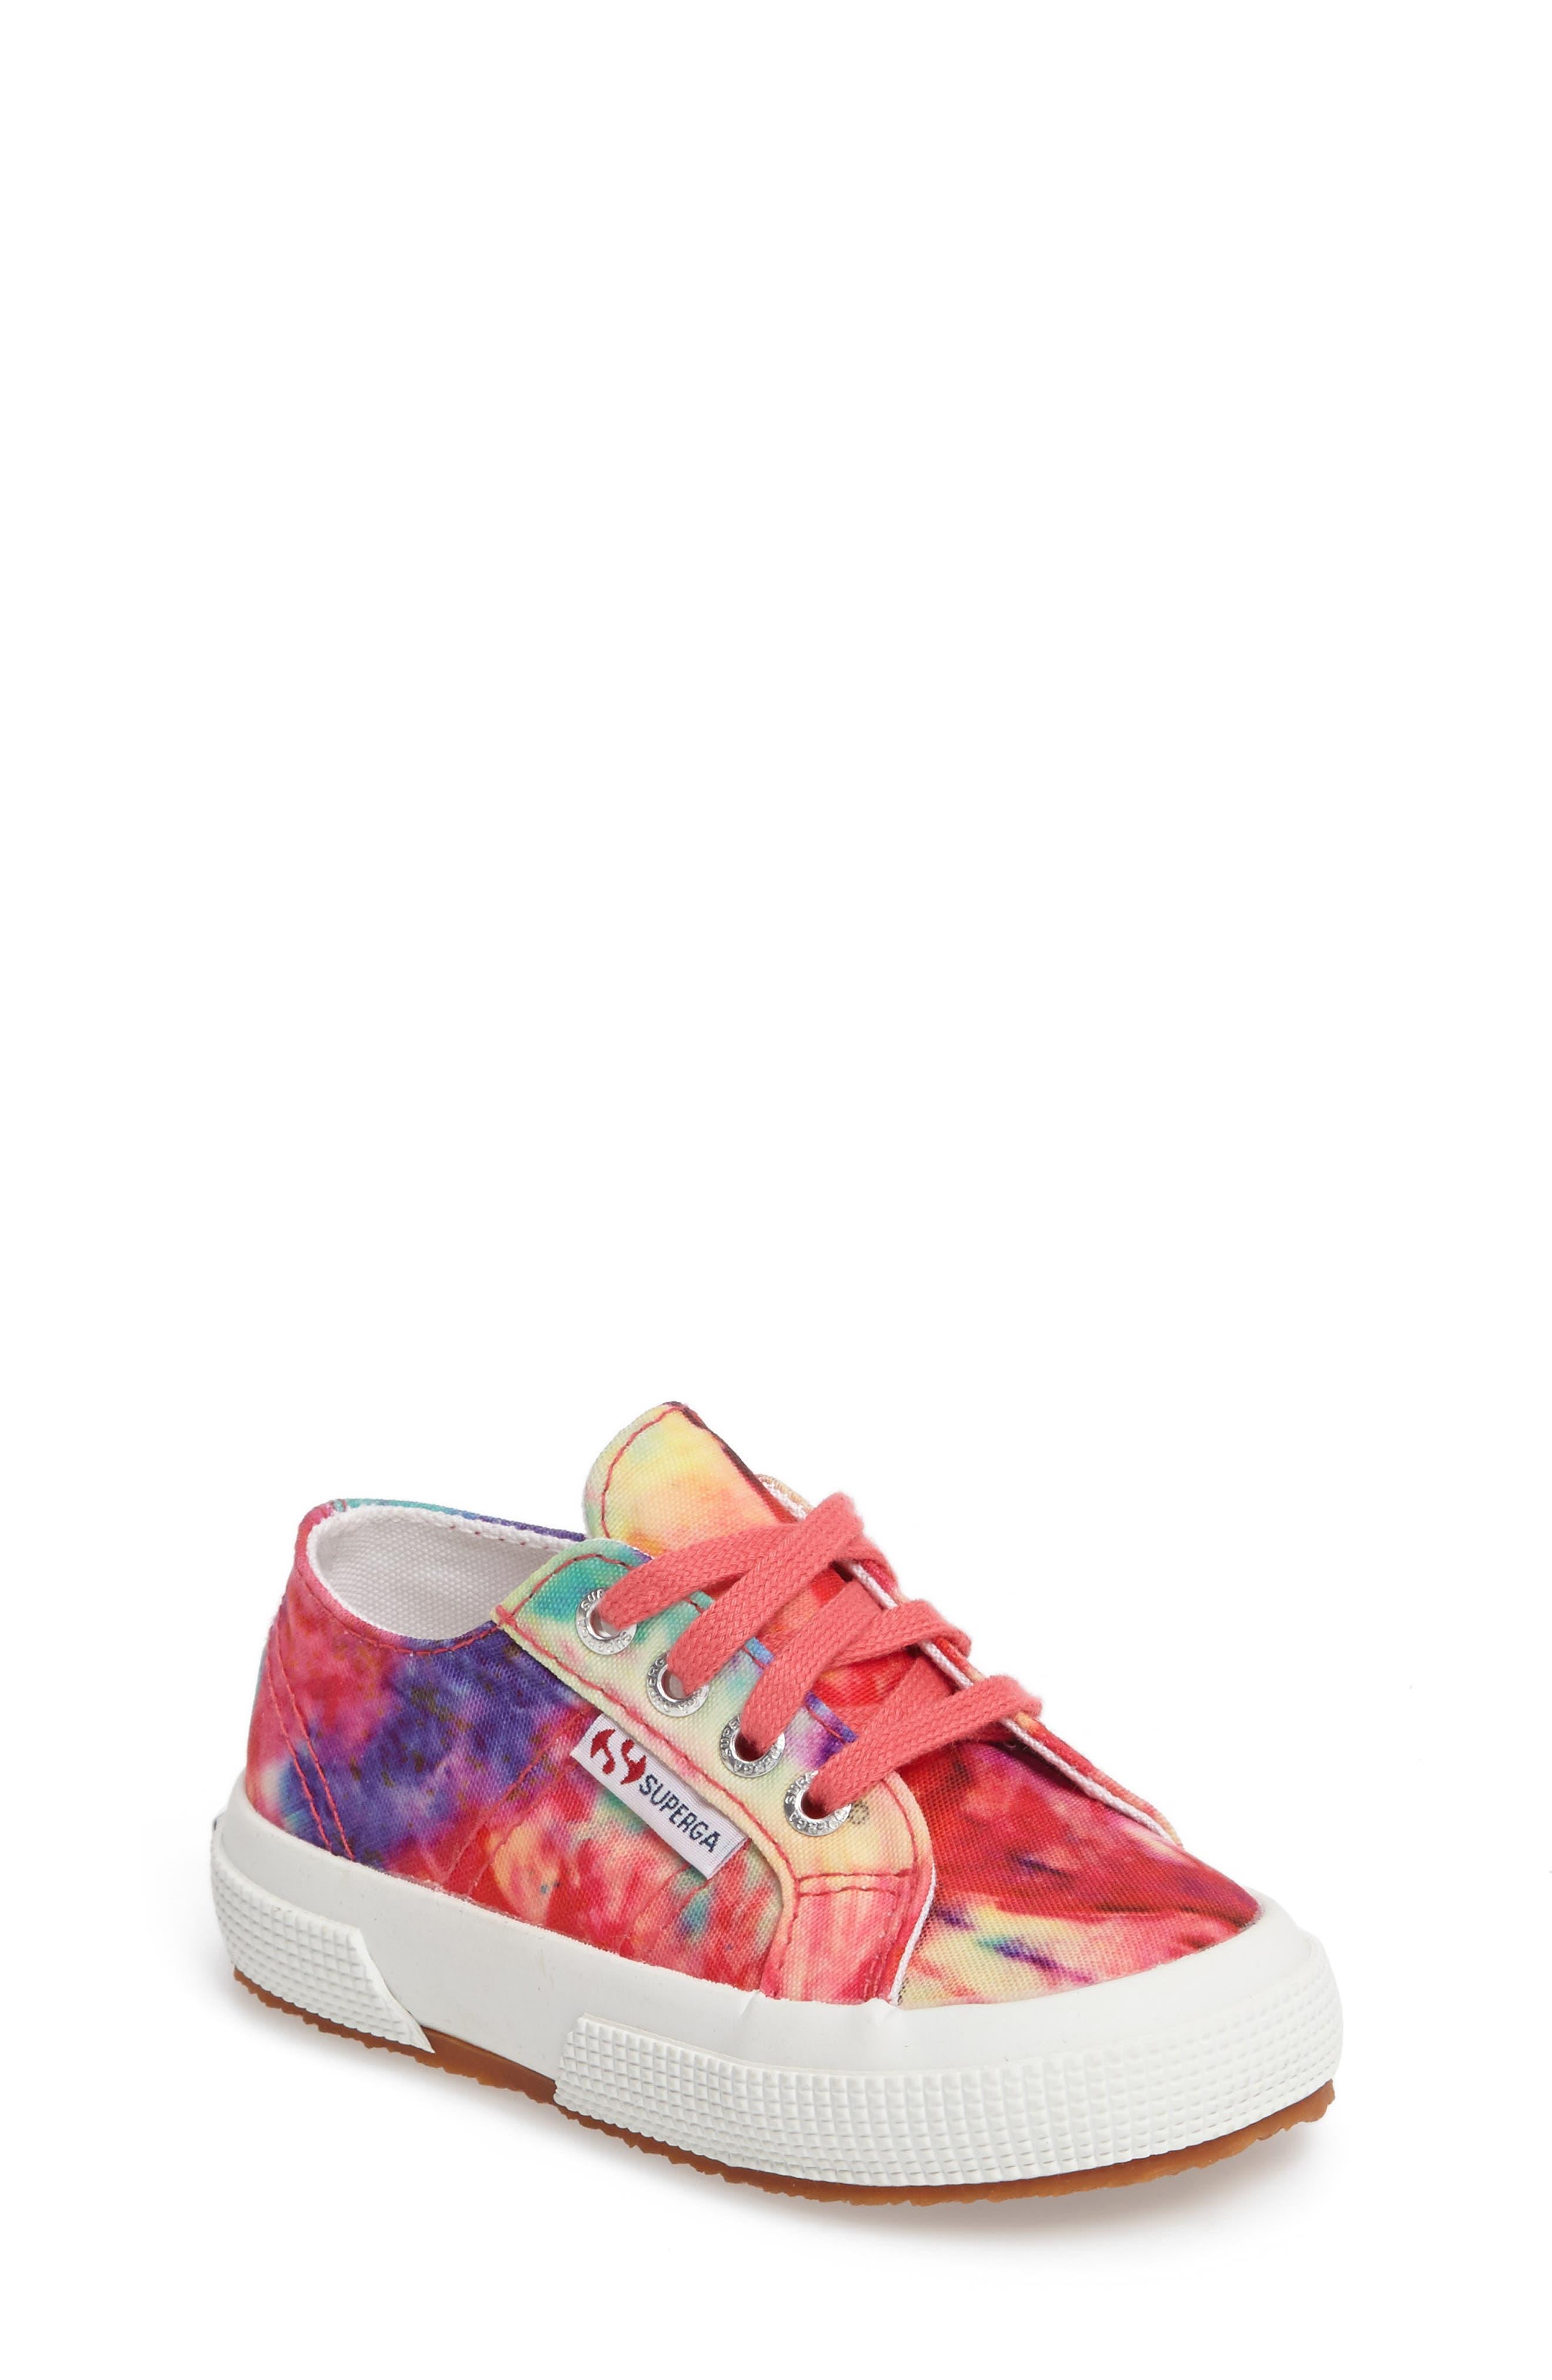 Alternate Image 1 Selected - Superga Tie Dye Classic Sneaker (Walker, Toddler & Little Kid)